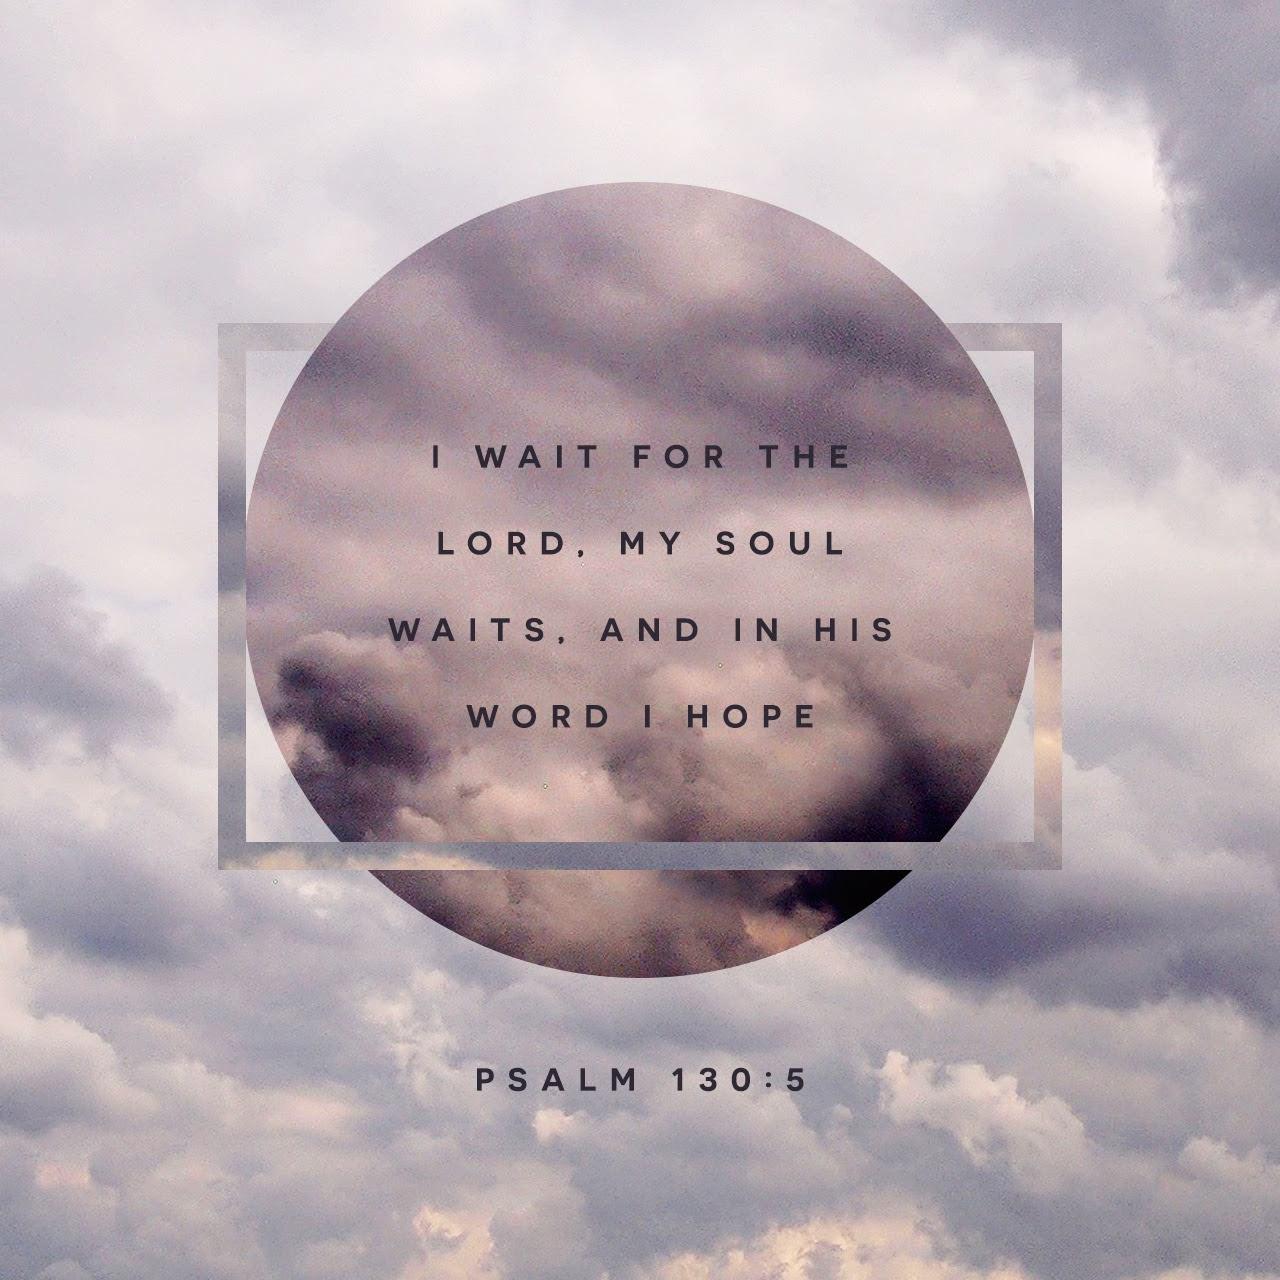 ScriptureArt_0817_-_Psalm_130_5_ESV_English.jpg